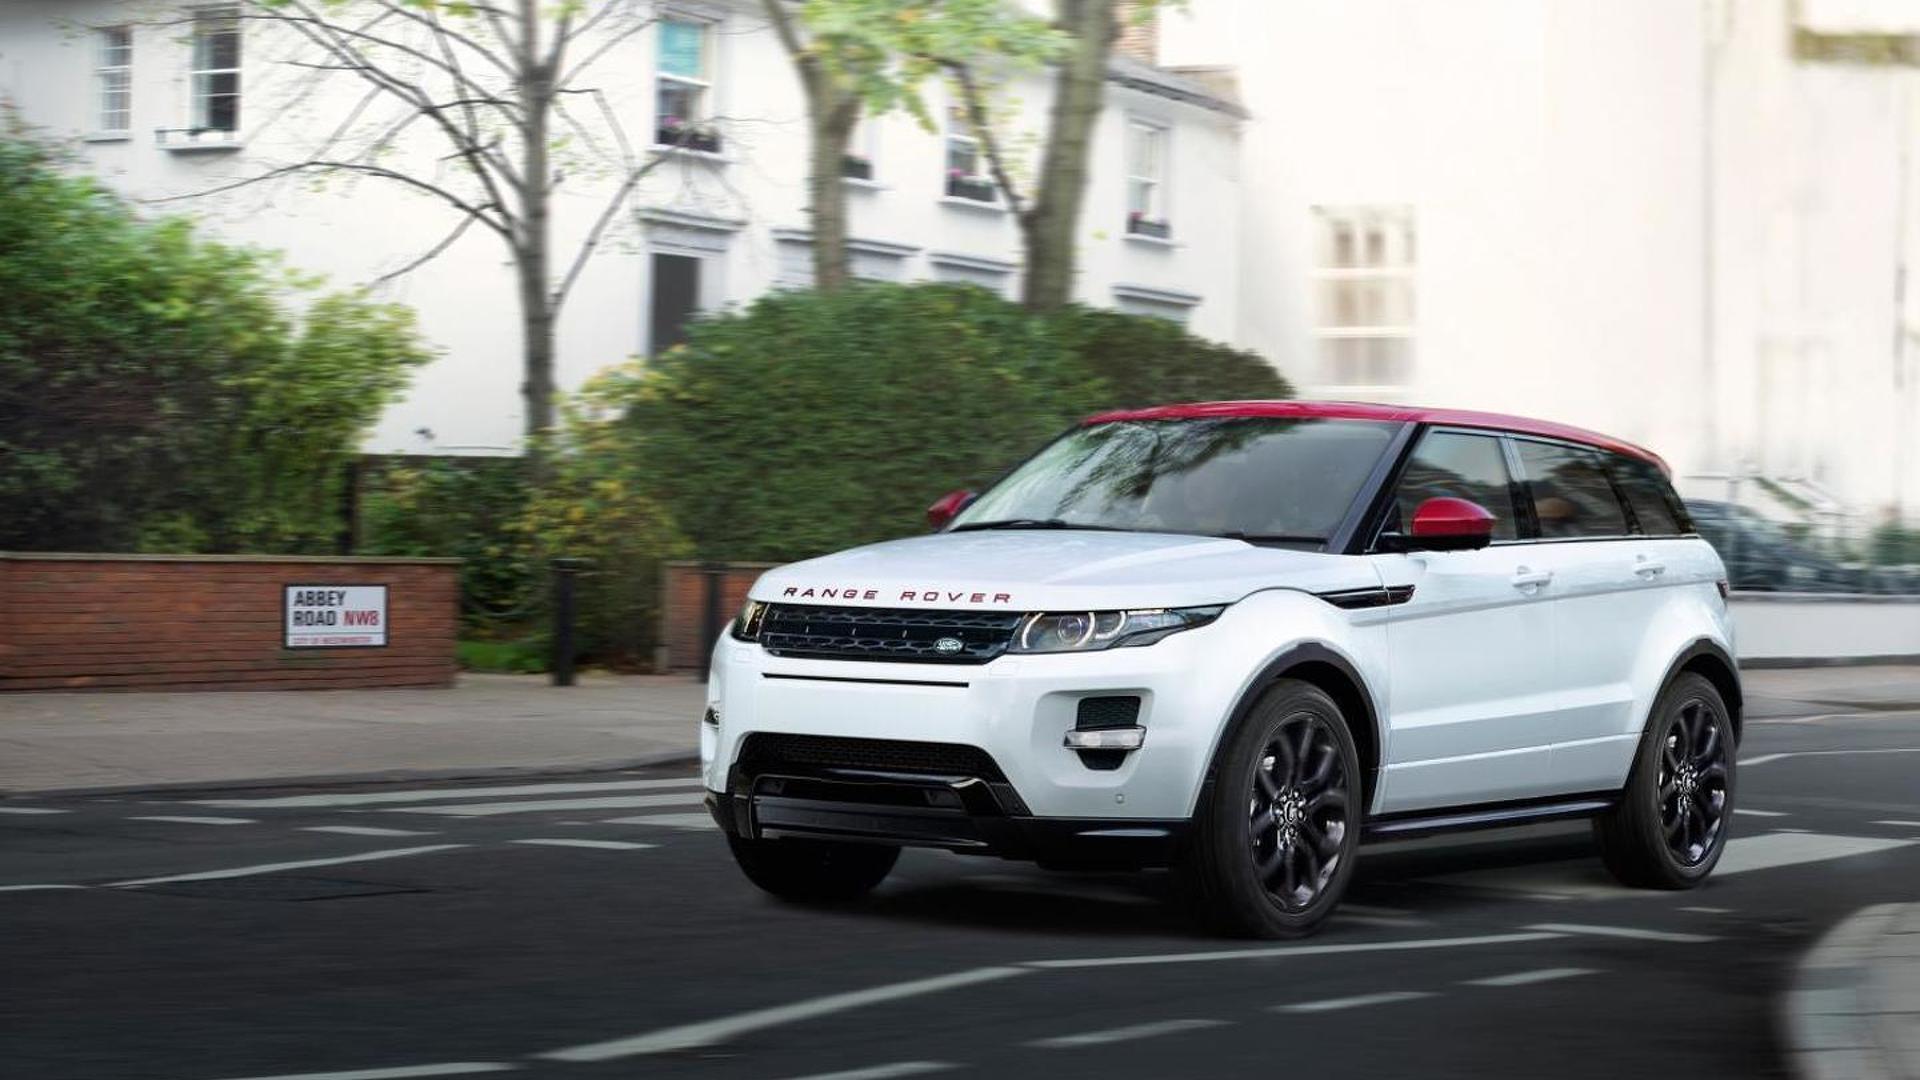 Land Rover reveals Range Rover Evoque NW8 special edition